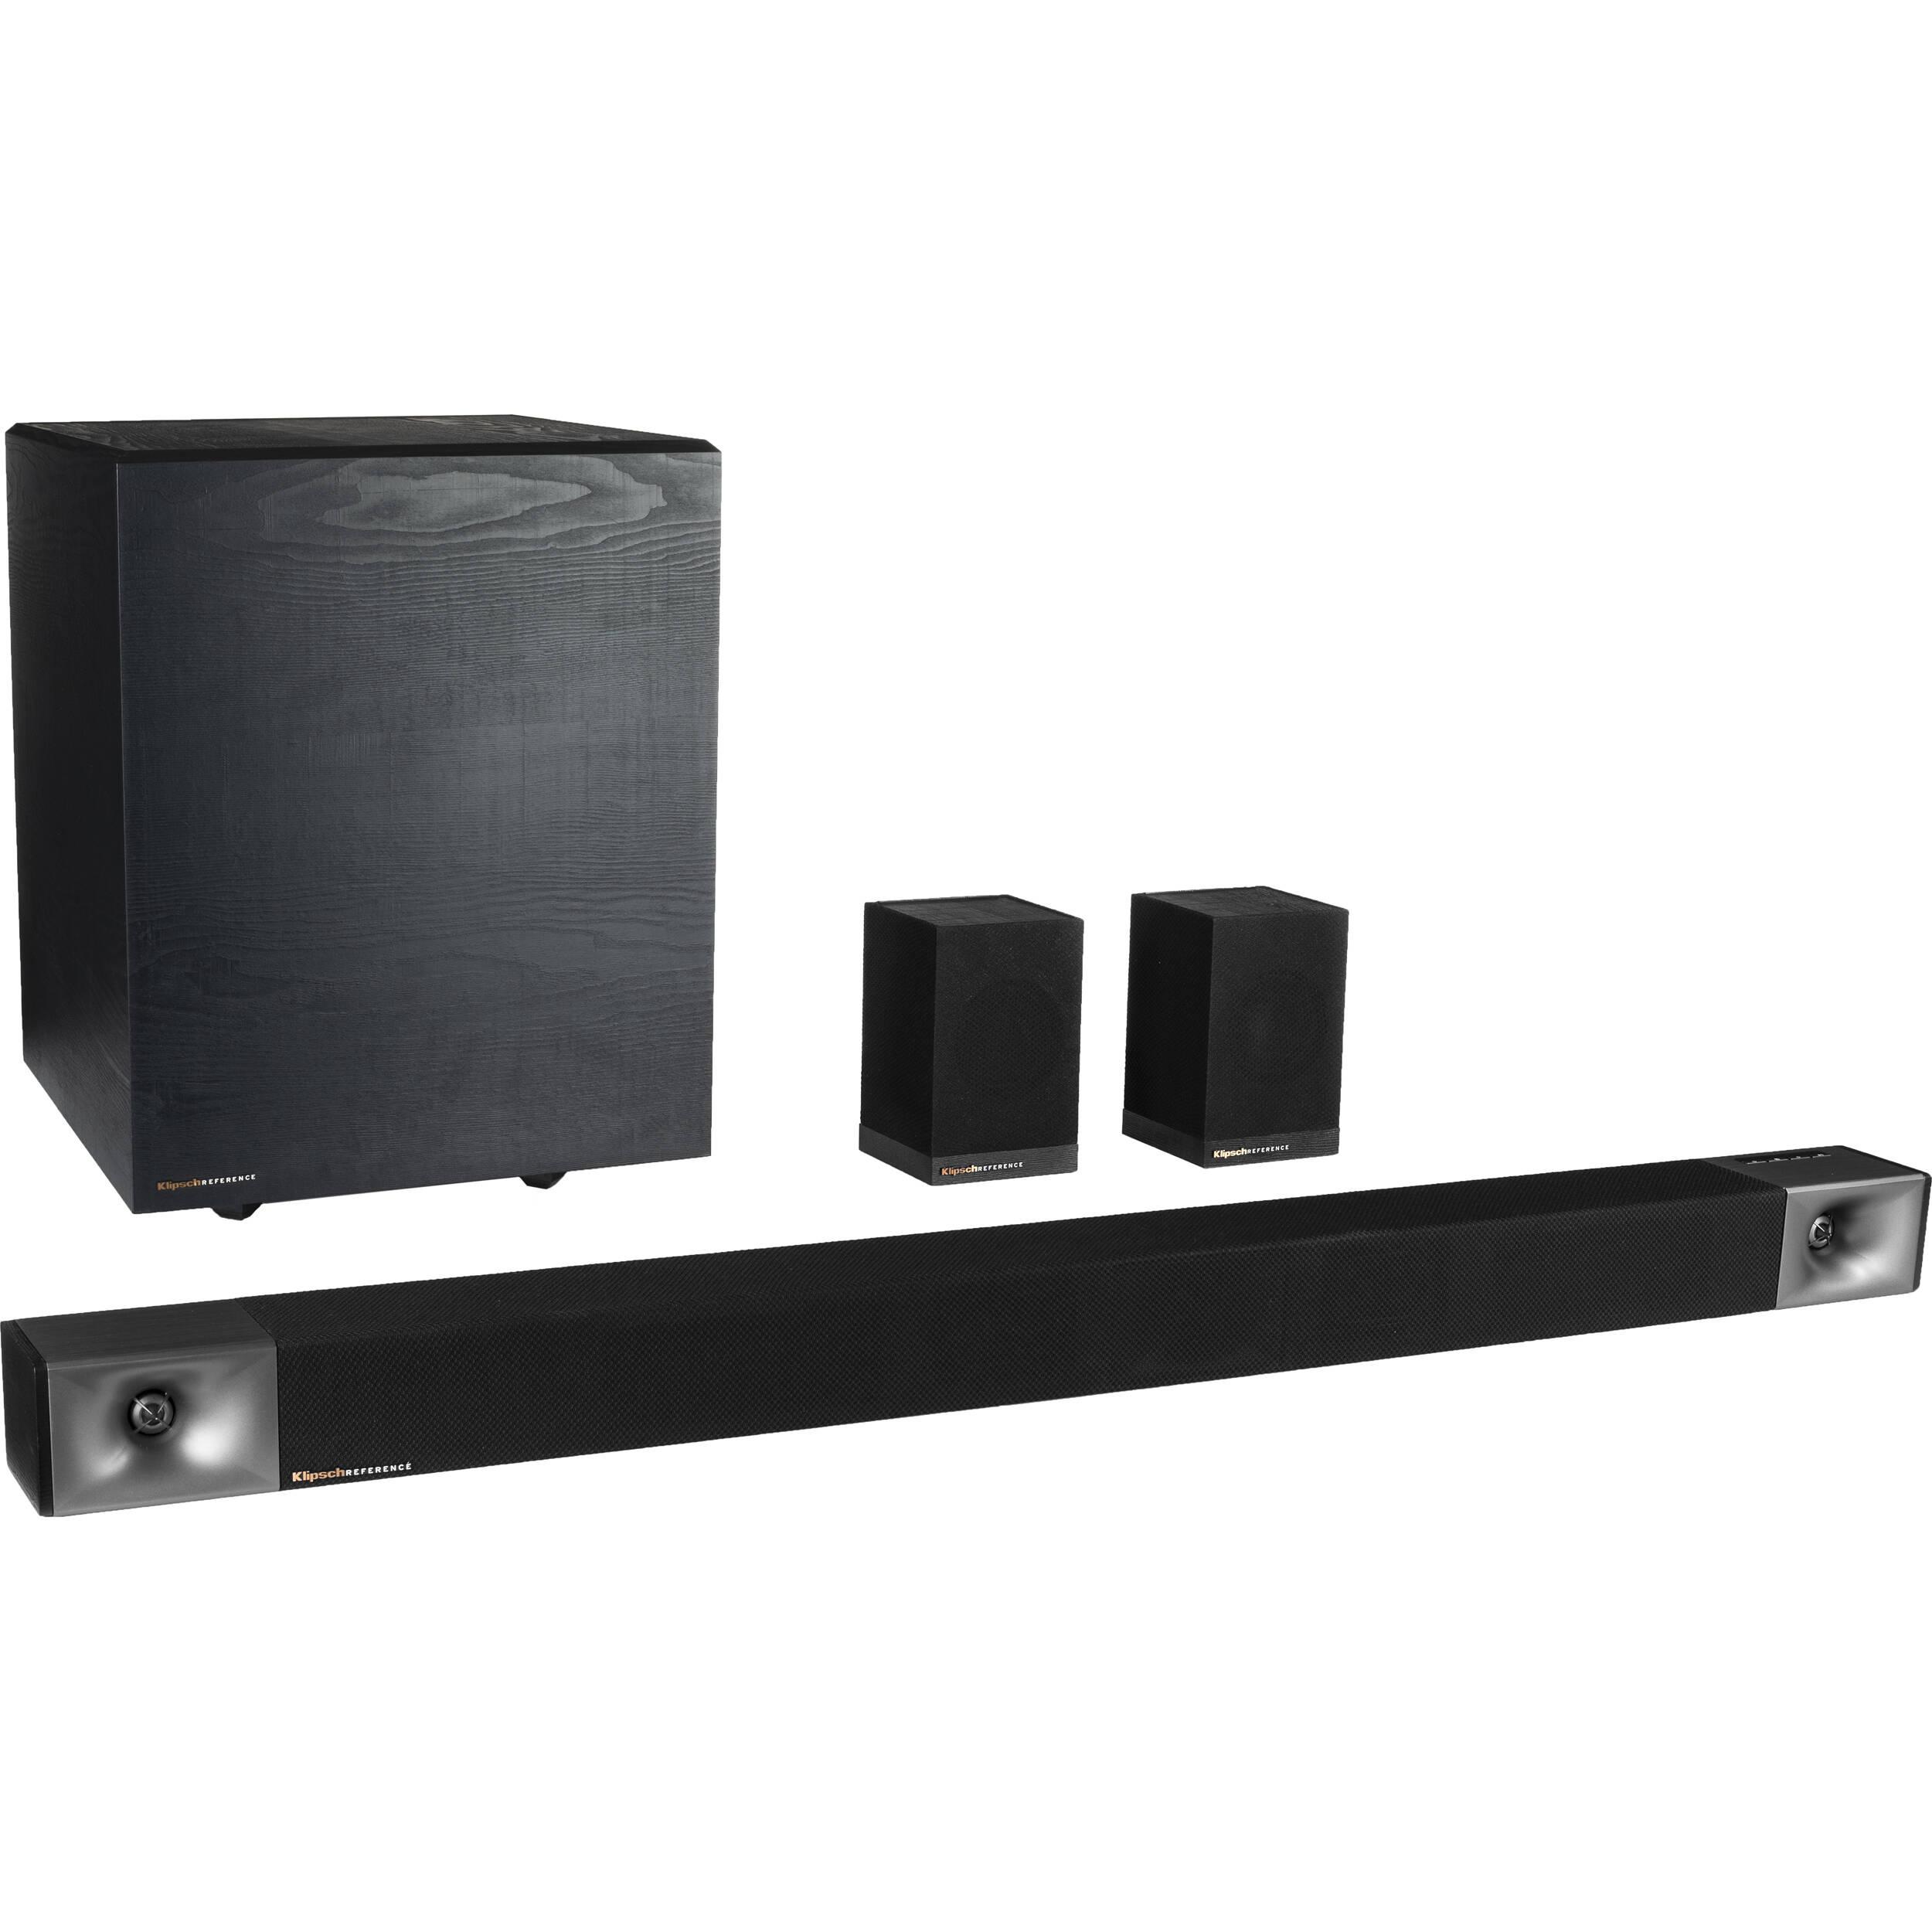 Klipsch Cinema 600 660W 5.1-Channel Soundbar System 1069452 B&H